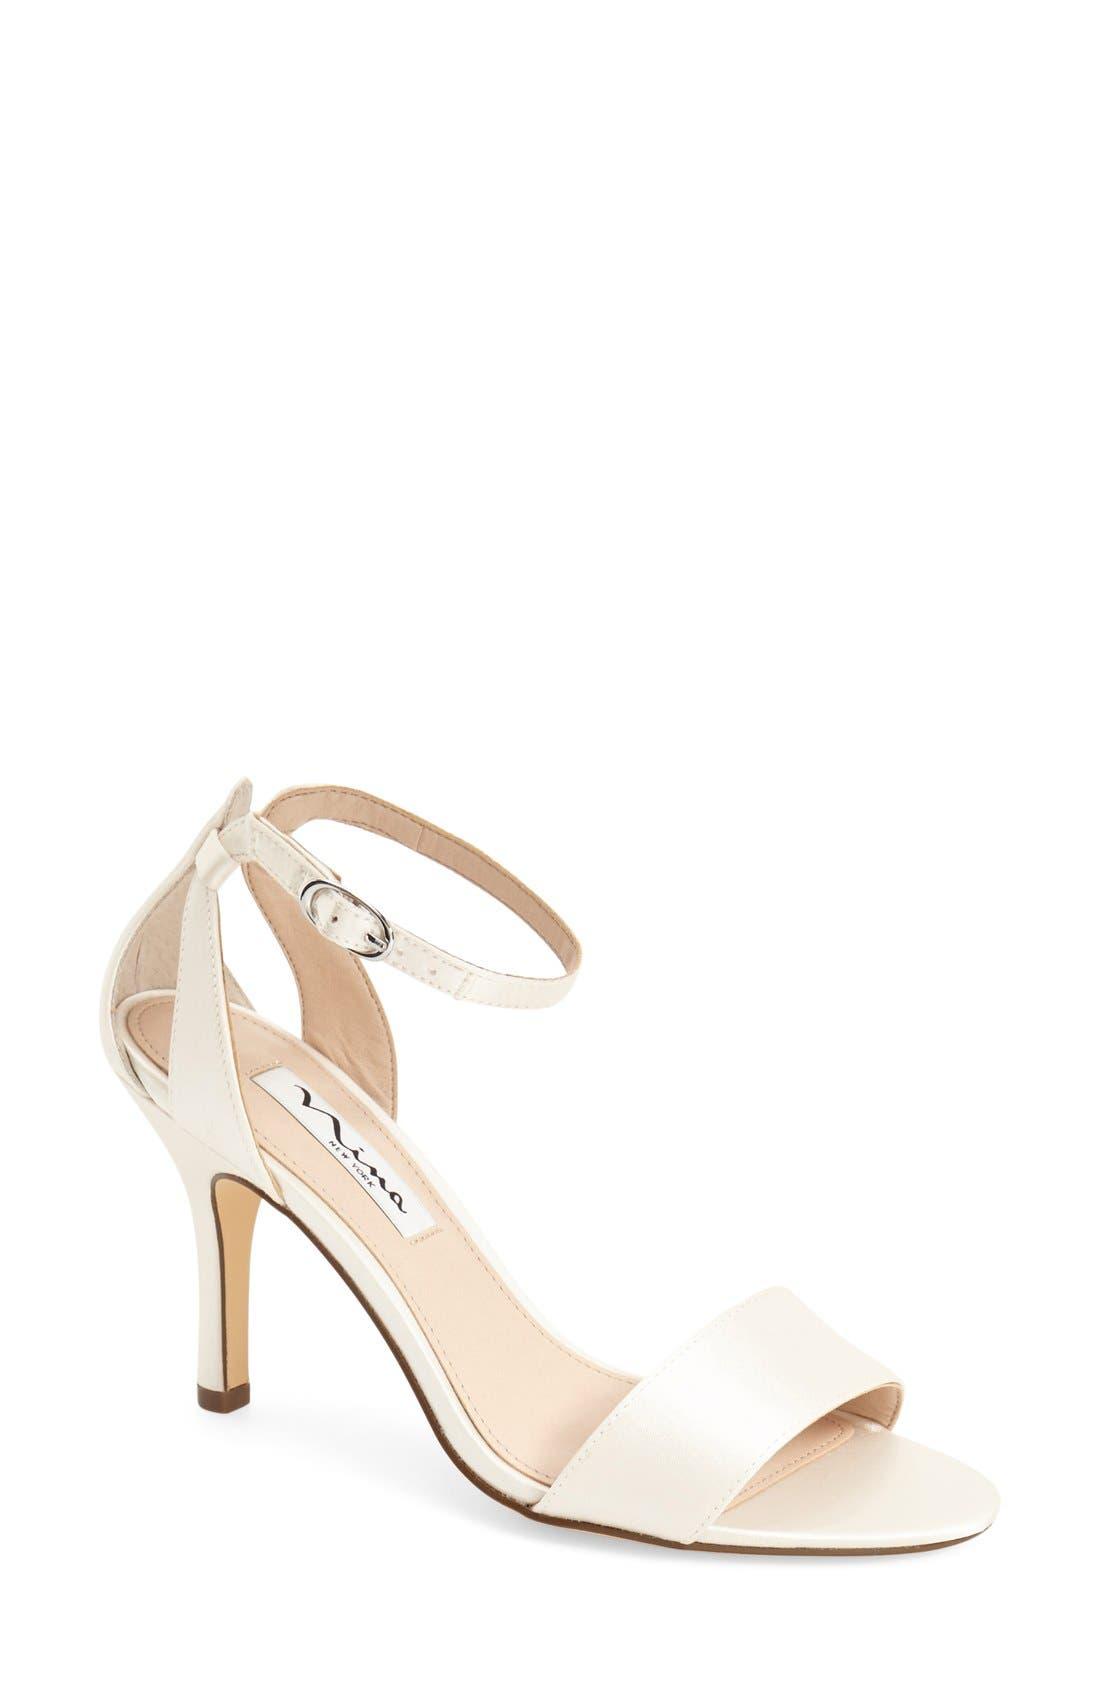 NINA 'Venetia' Ankle Strap Sandal, Main, color, IVORY